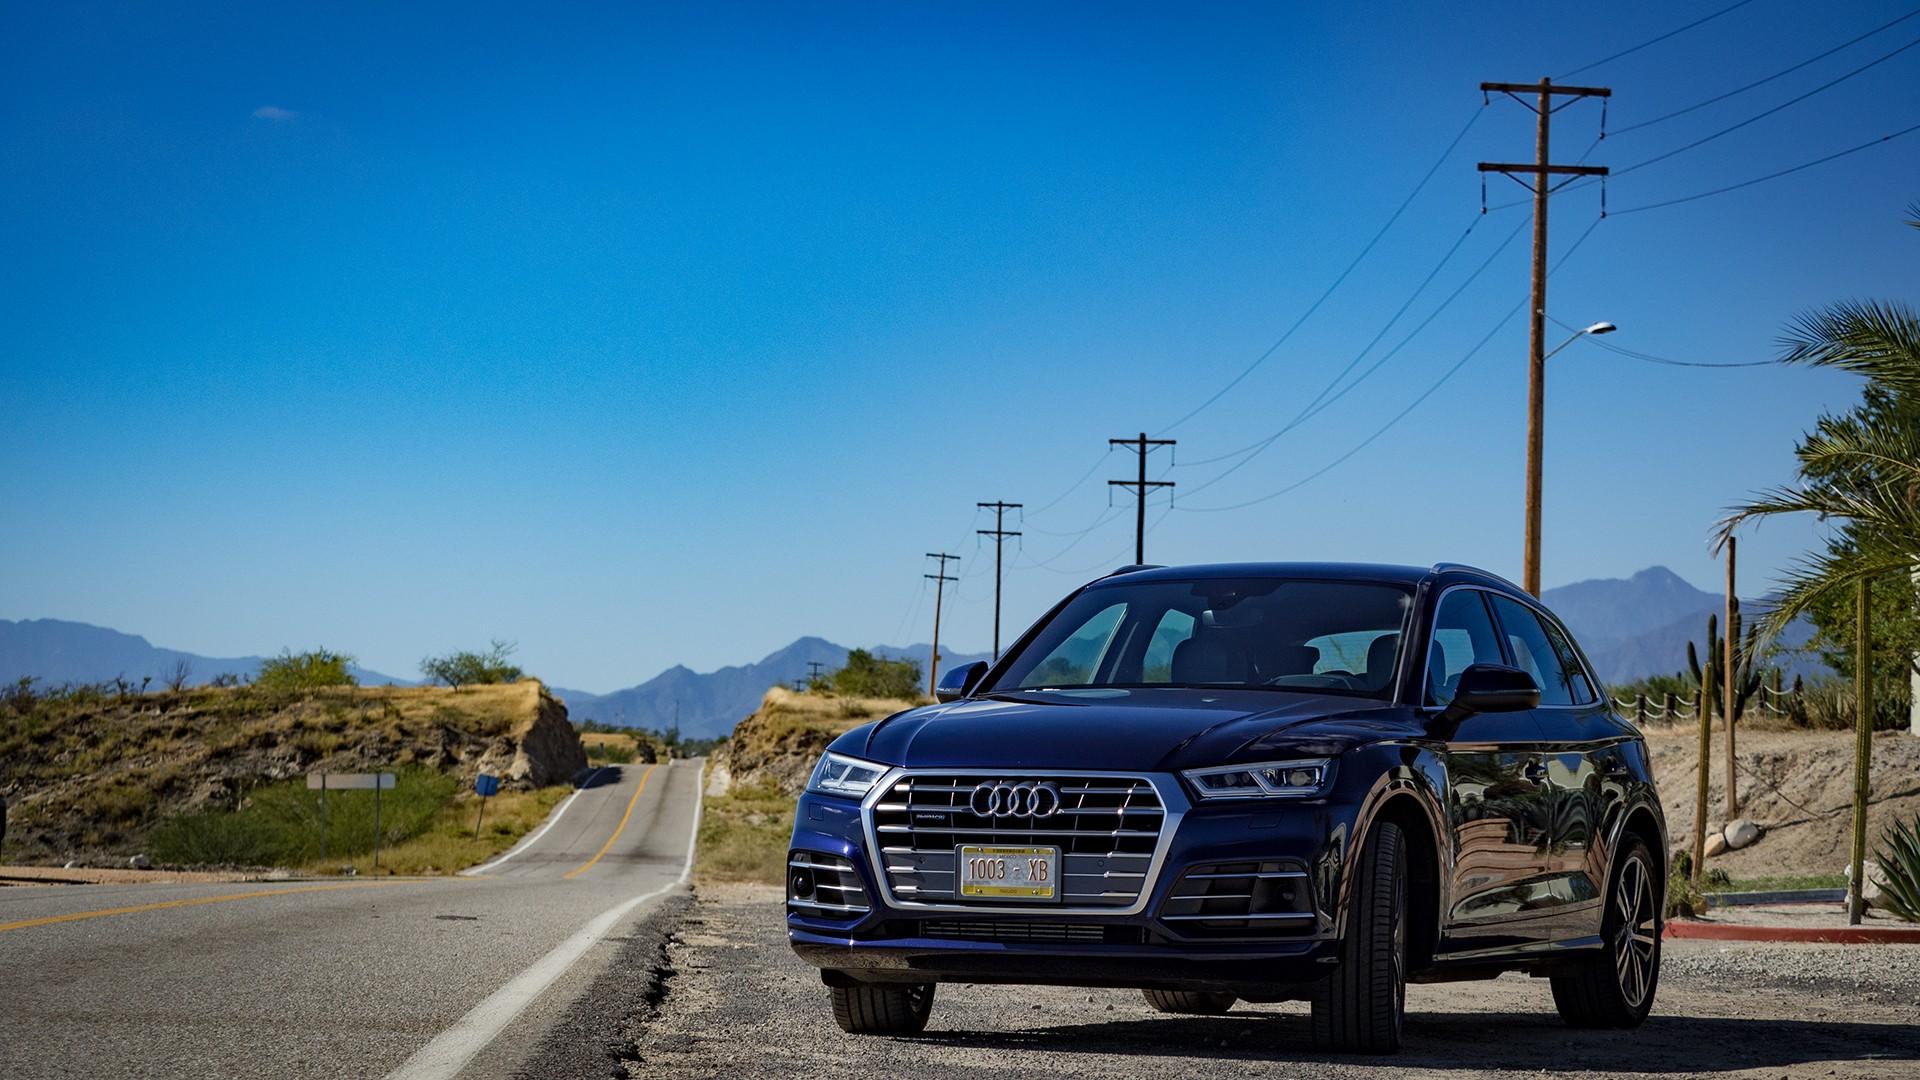 Audi Q5 Quattro - Bild: Sandra Schink